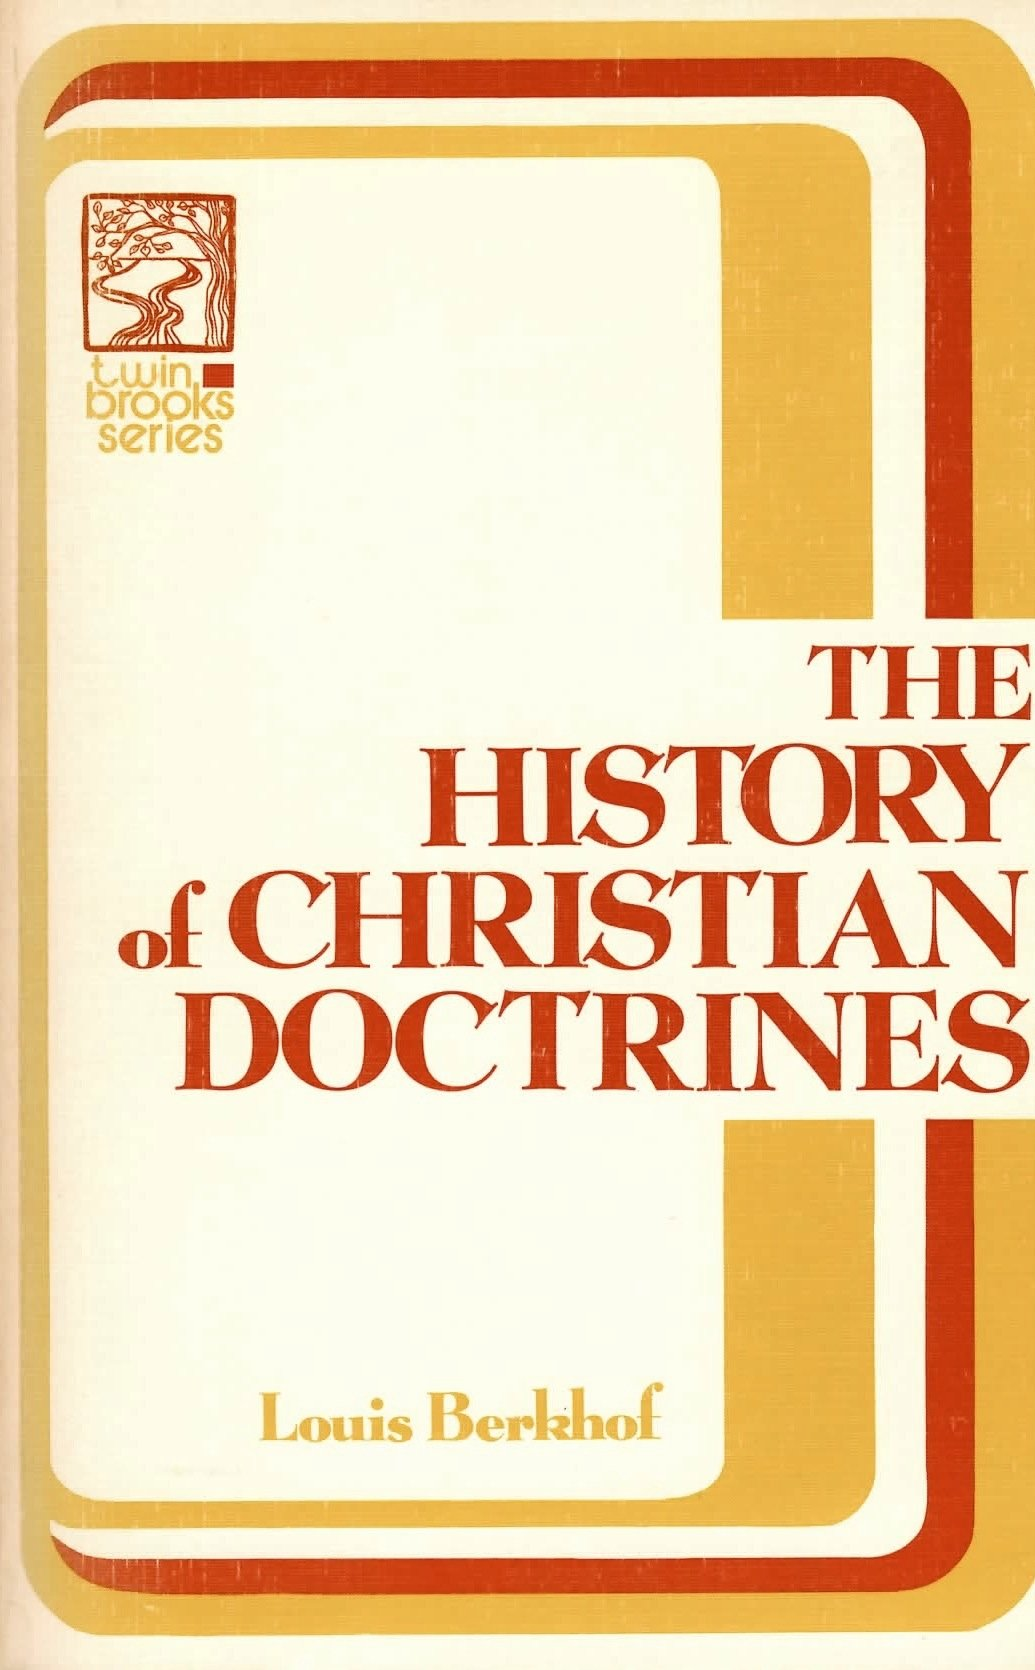 The History of Christian Doctrines: Louis Berkhof: 9780801006364:  Amazon.com: Books